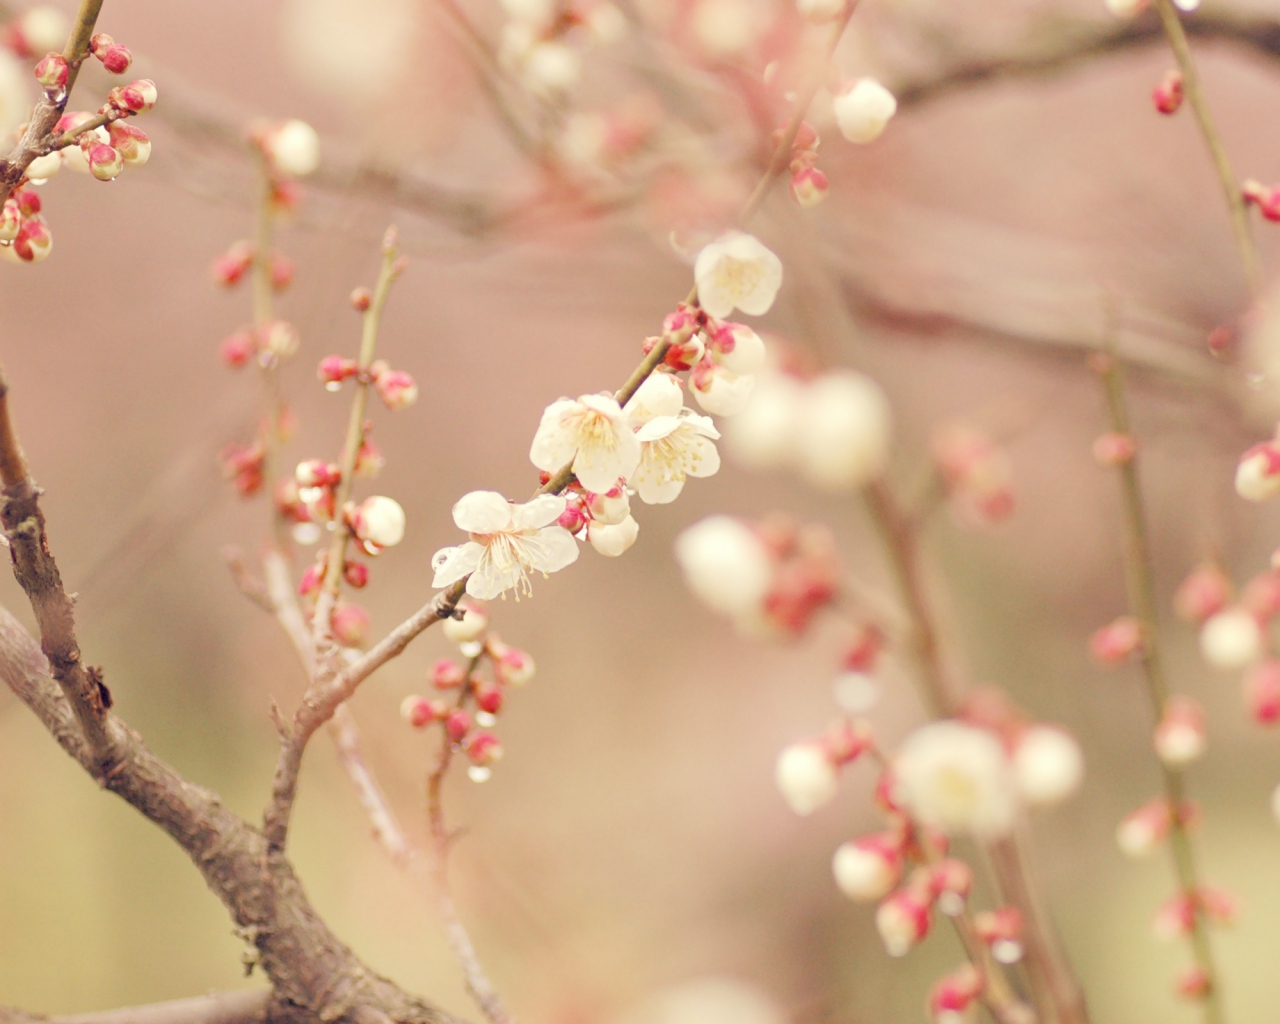 spring_tree_blossom_flowers_49973_1280x1024